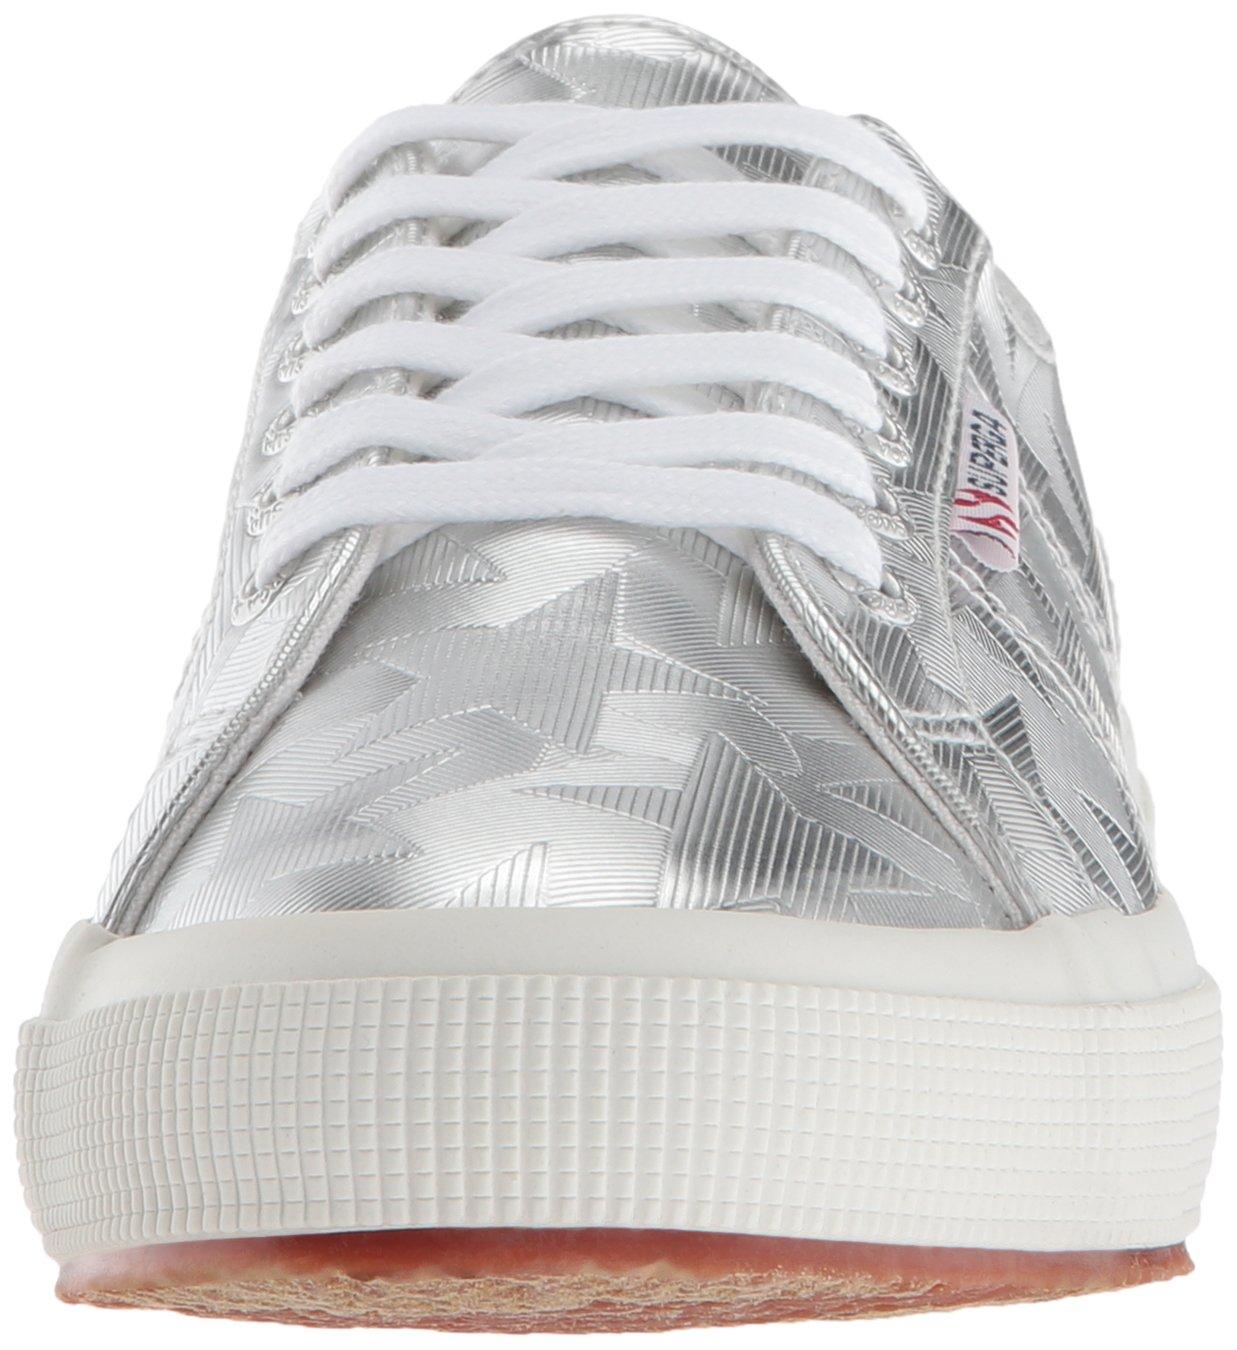 Superga B078KDT3SN Women's 2750 Starchromw Sneaker B078KDT3SN Superga 41 M US|Silver ab92dc